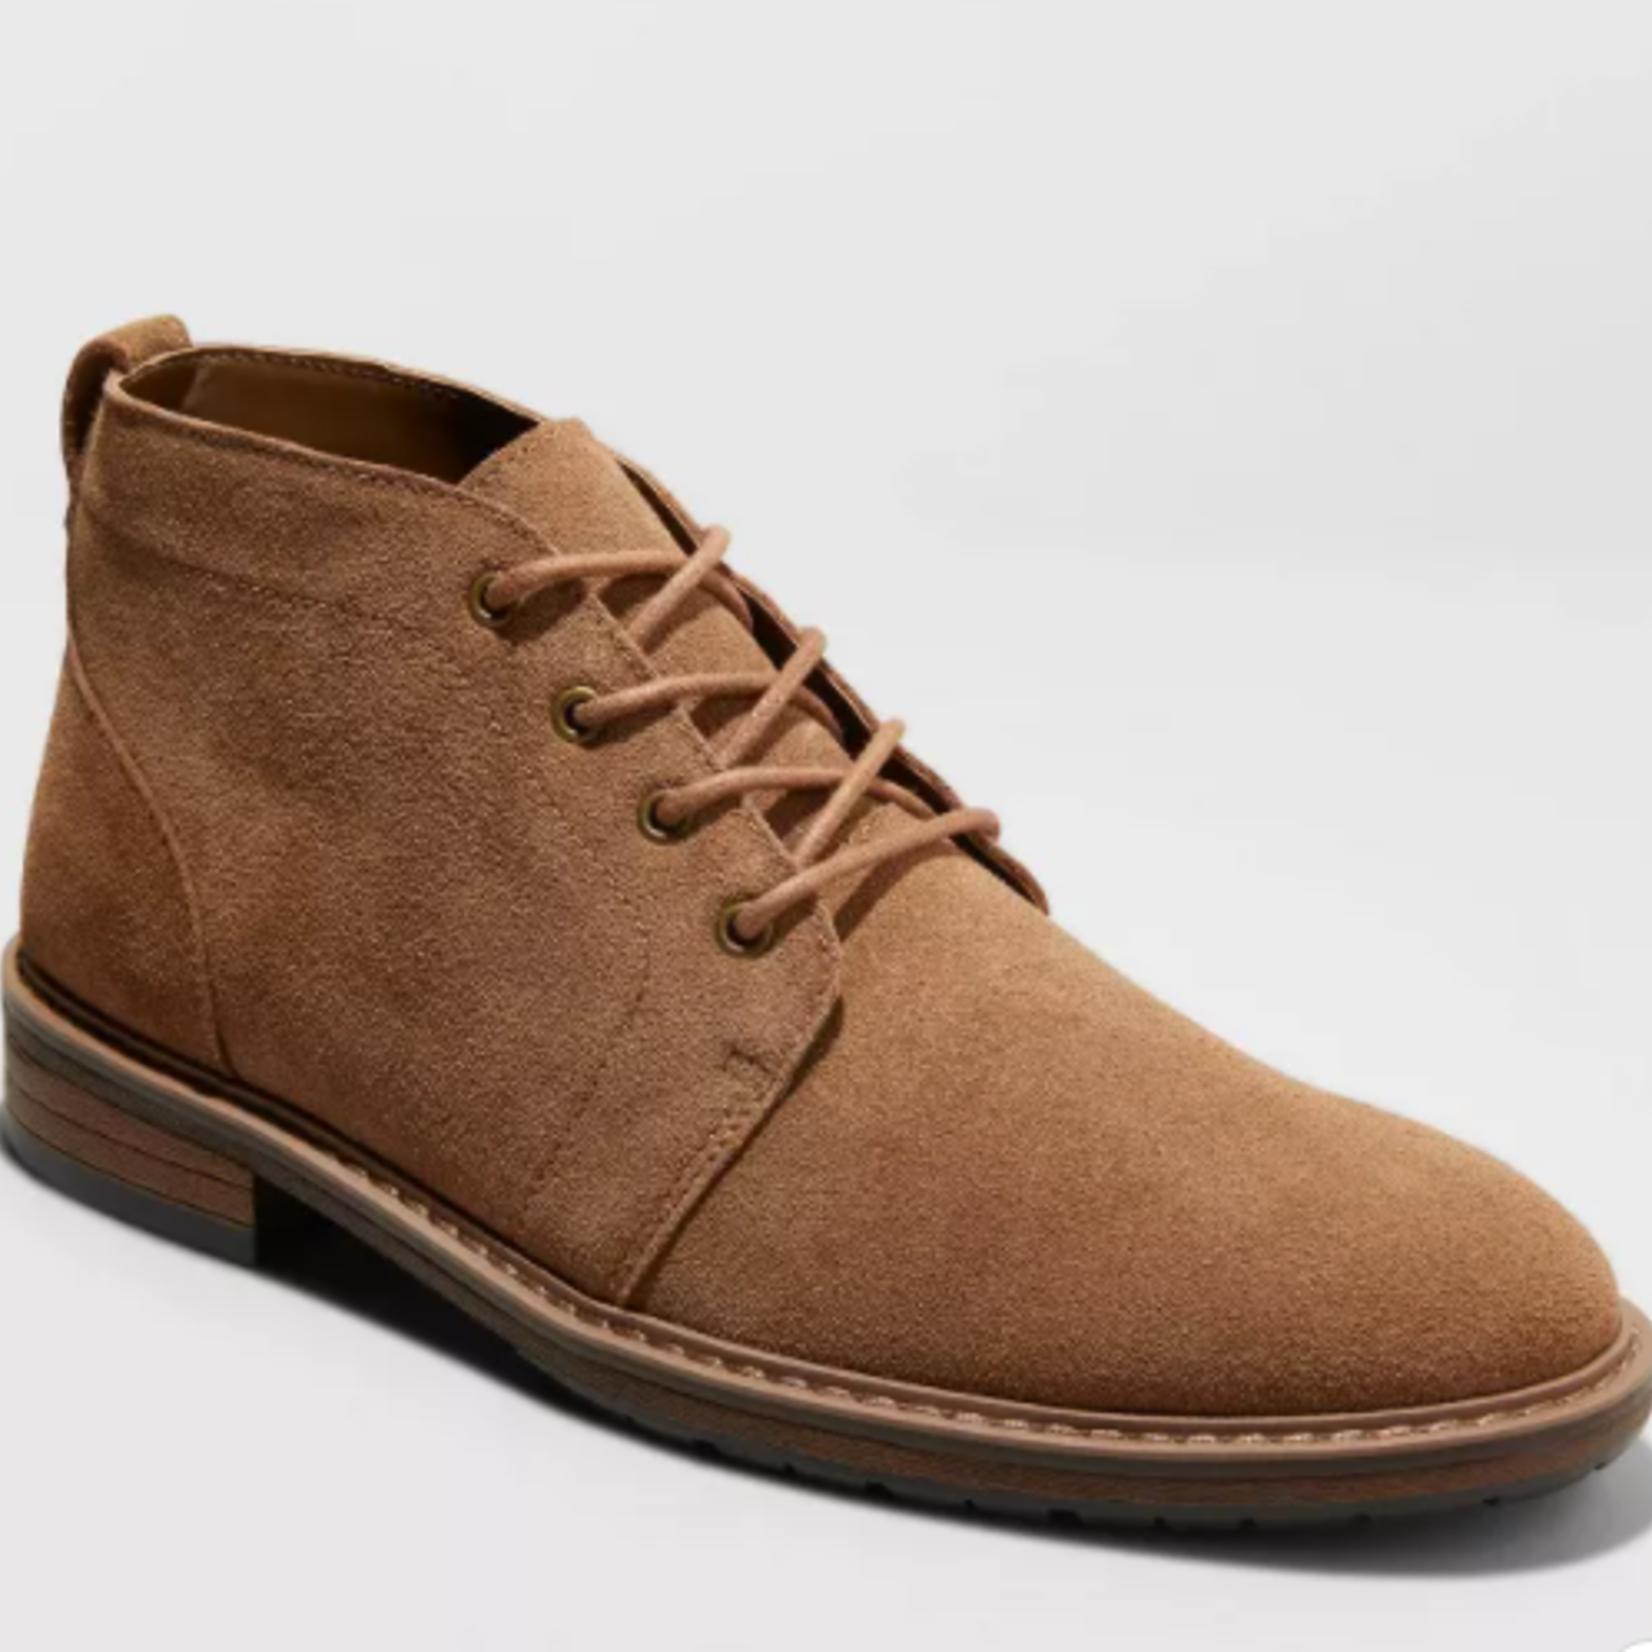 Goodfellow Men's Brantley Genuine Leather Boots -11.5